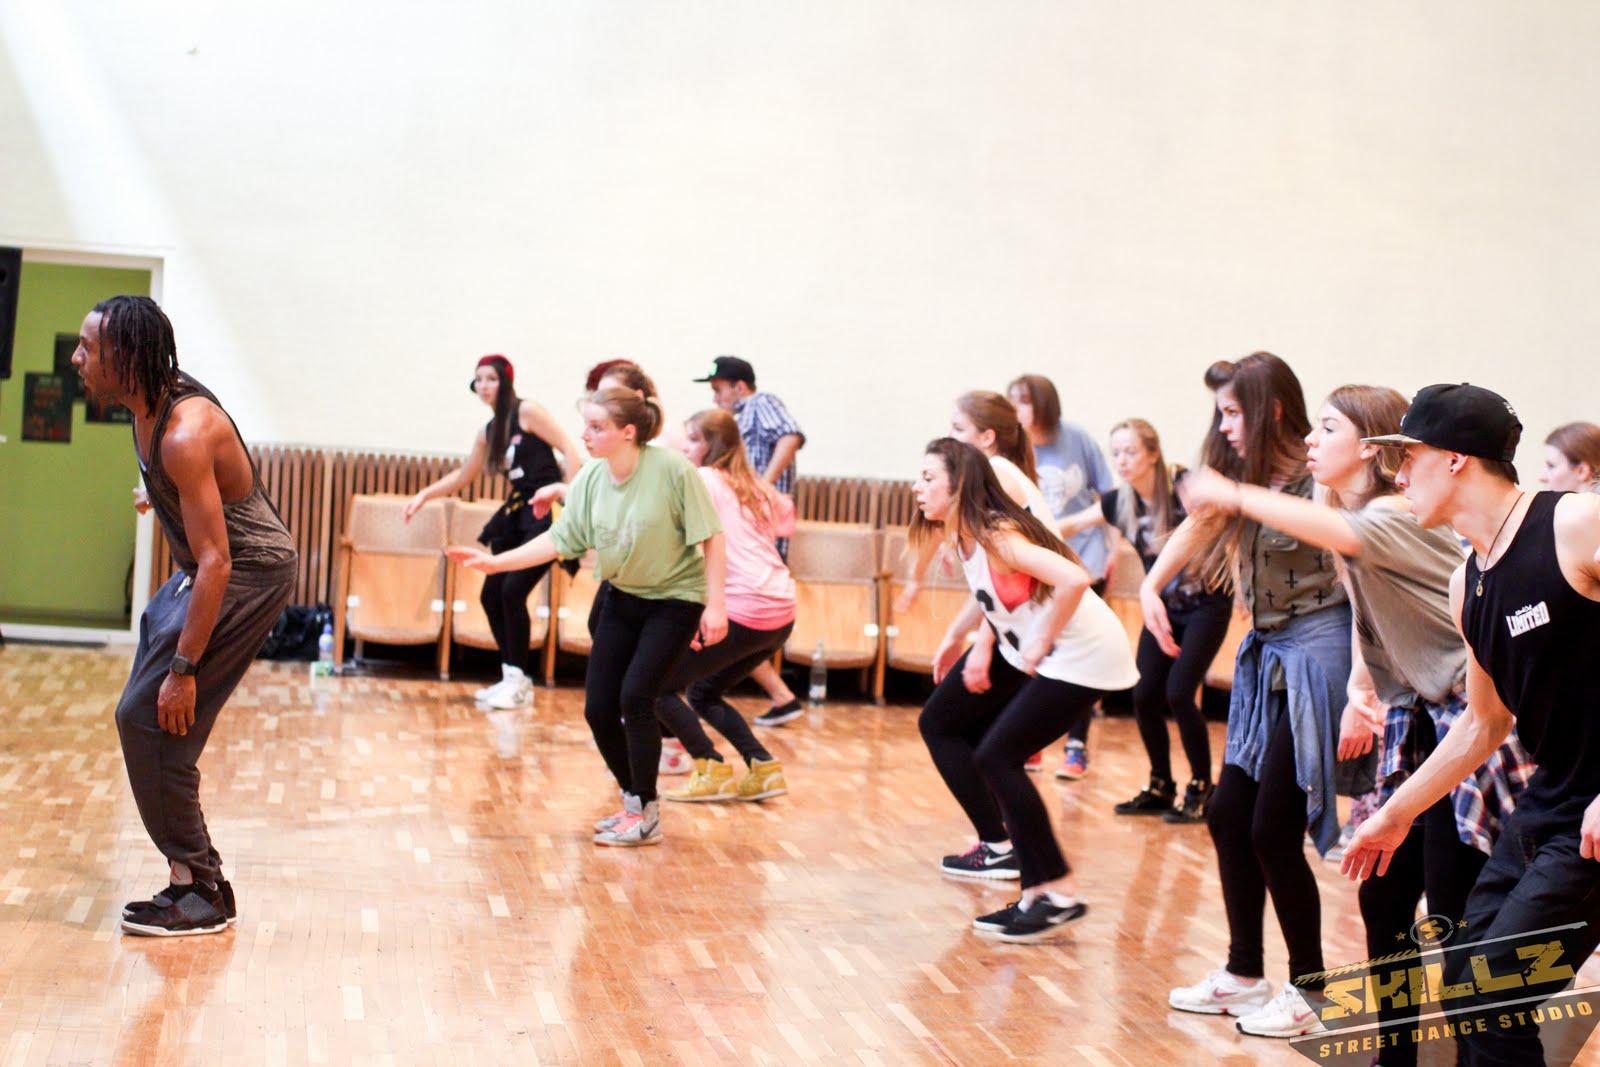 Dancehall workshop with Camron One Shot - IMG_7830.jpg